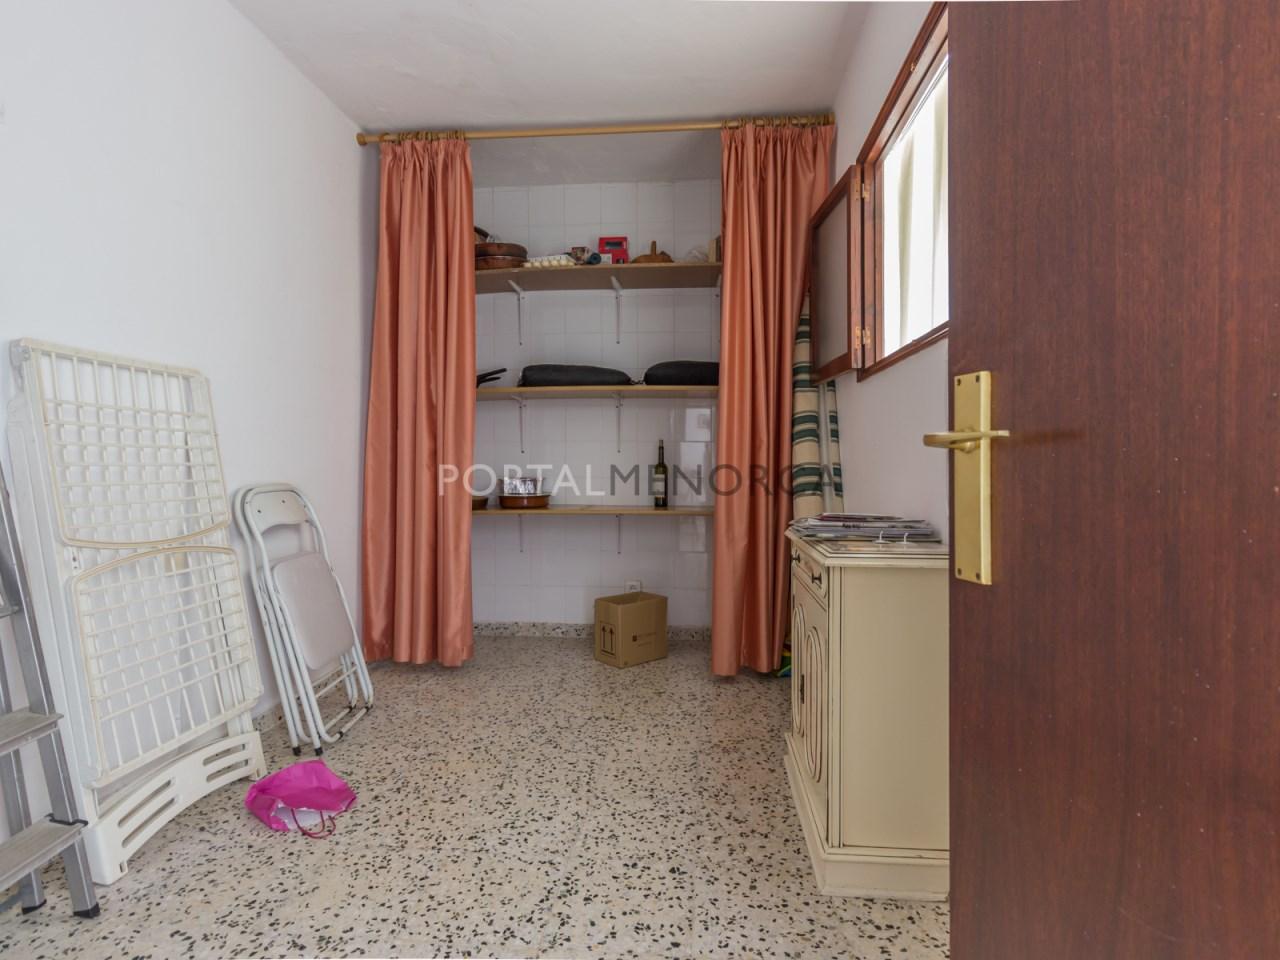 maison bord du mer a cala mesquida, Minorque (8 de 15)